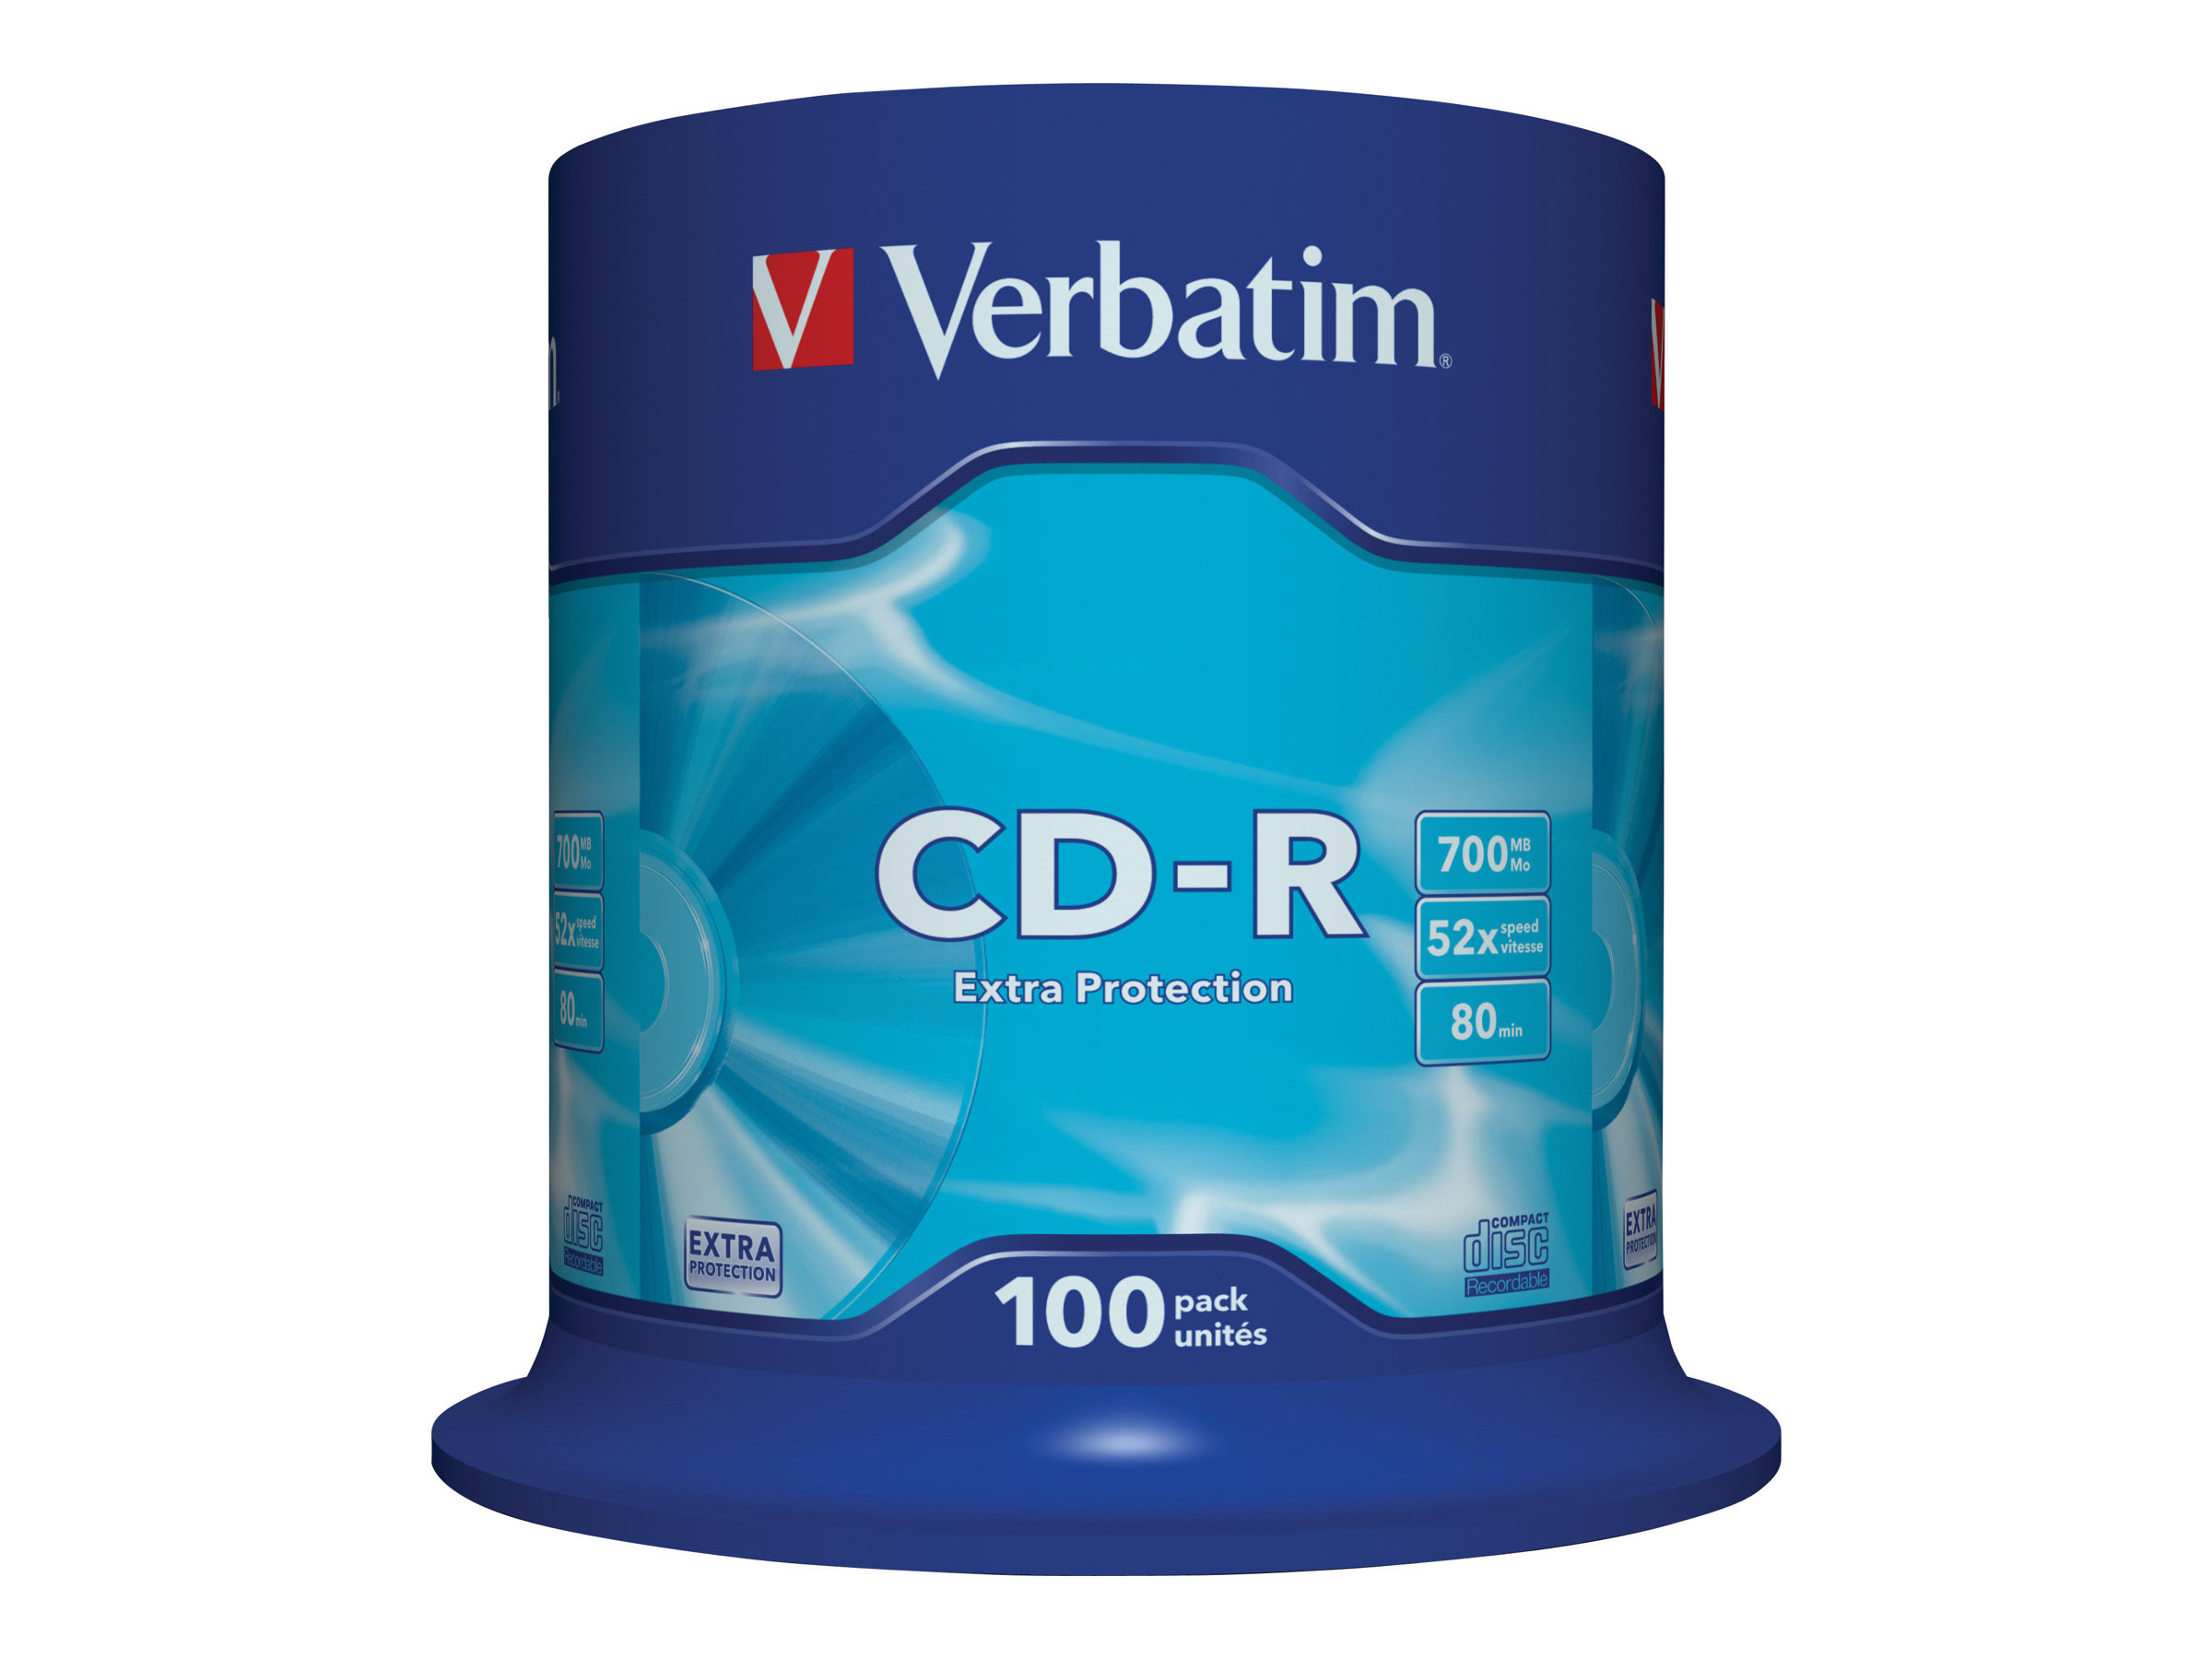 Verbatim - 100 x CD-R - 700 MB (80 Min) 52x - Spindel